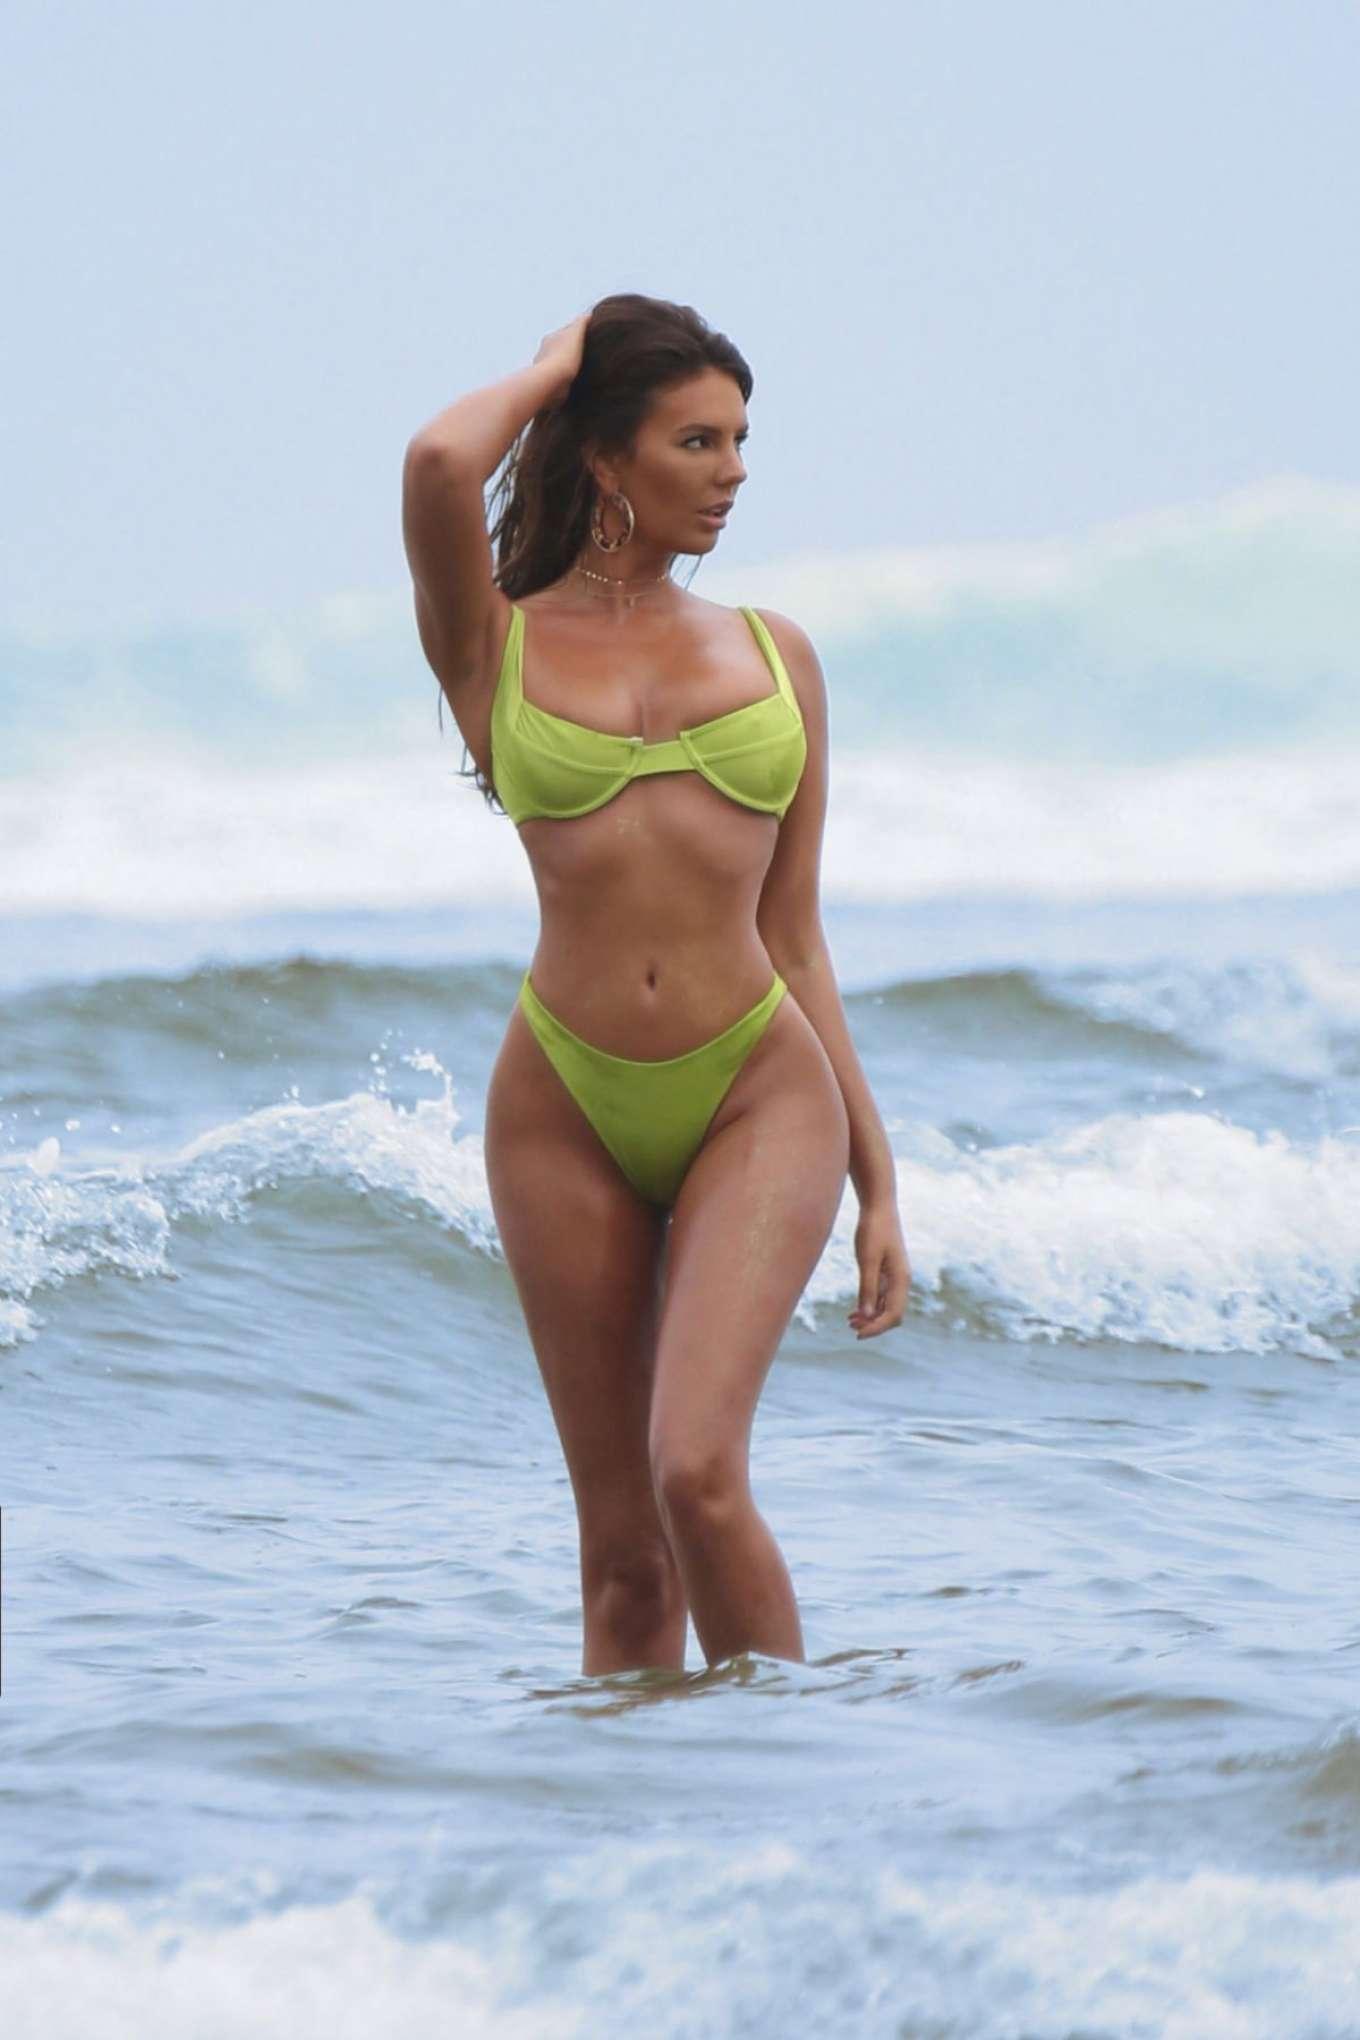 Zita Vass in Bikini on a Photoshoot in Malibu